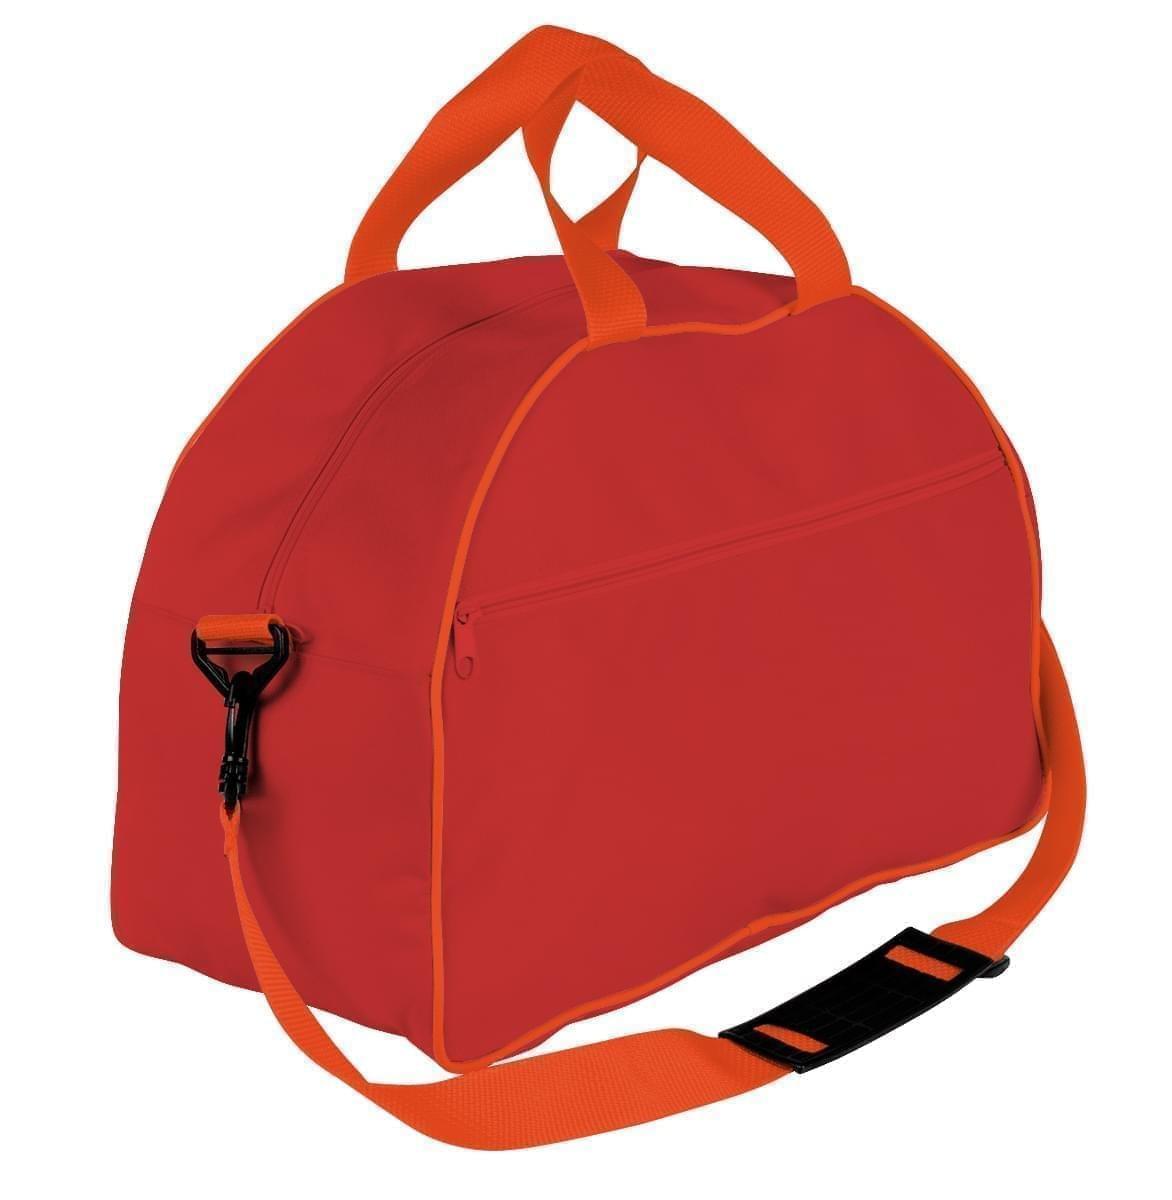 USA Made Nylon Poly Weekender Duffel Bags, Red-Orange, 6PKV32JAZ0